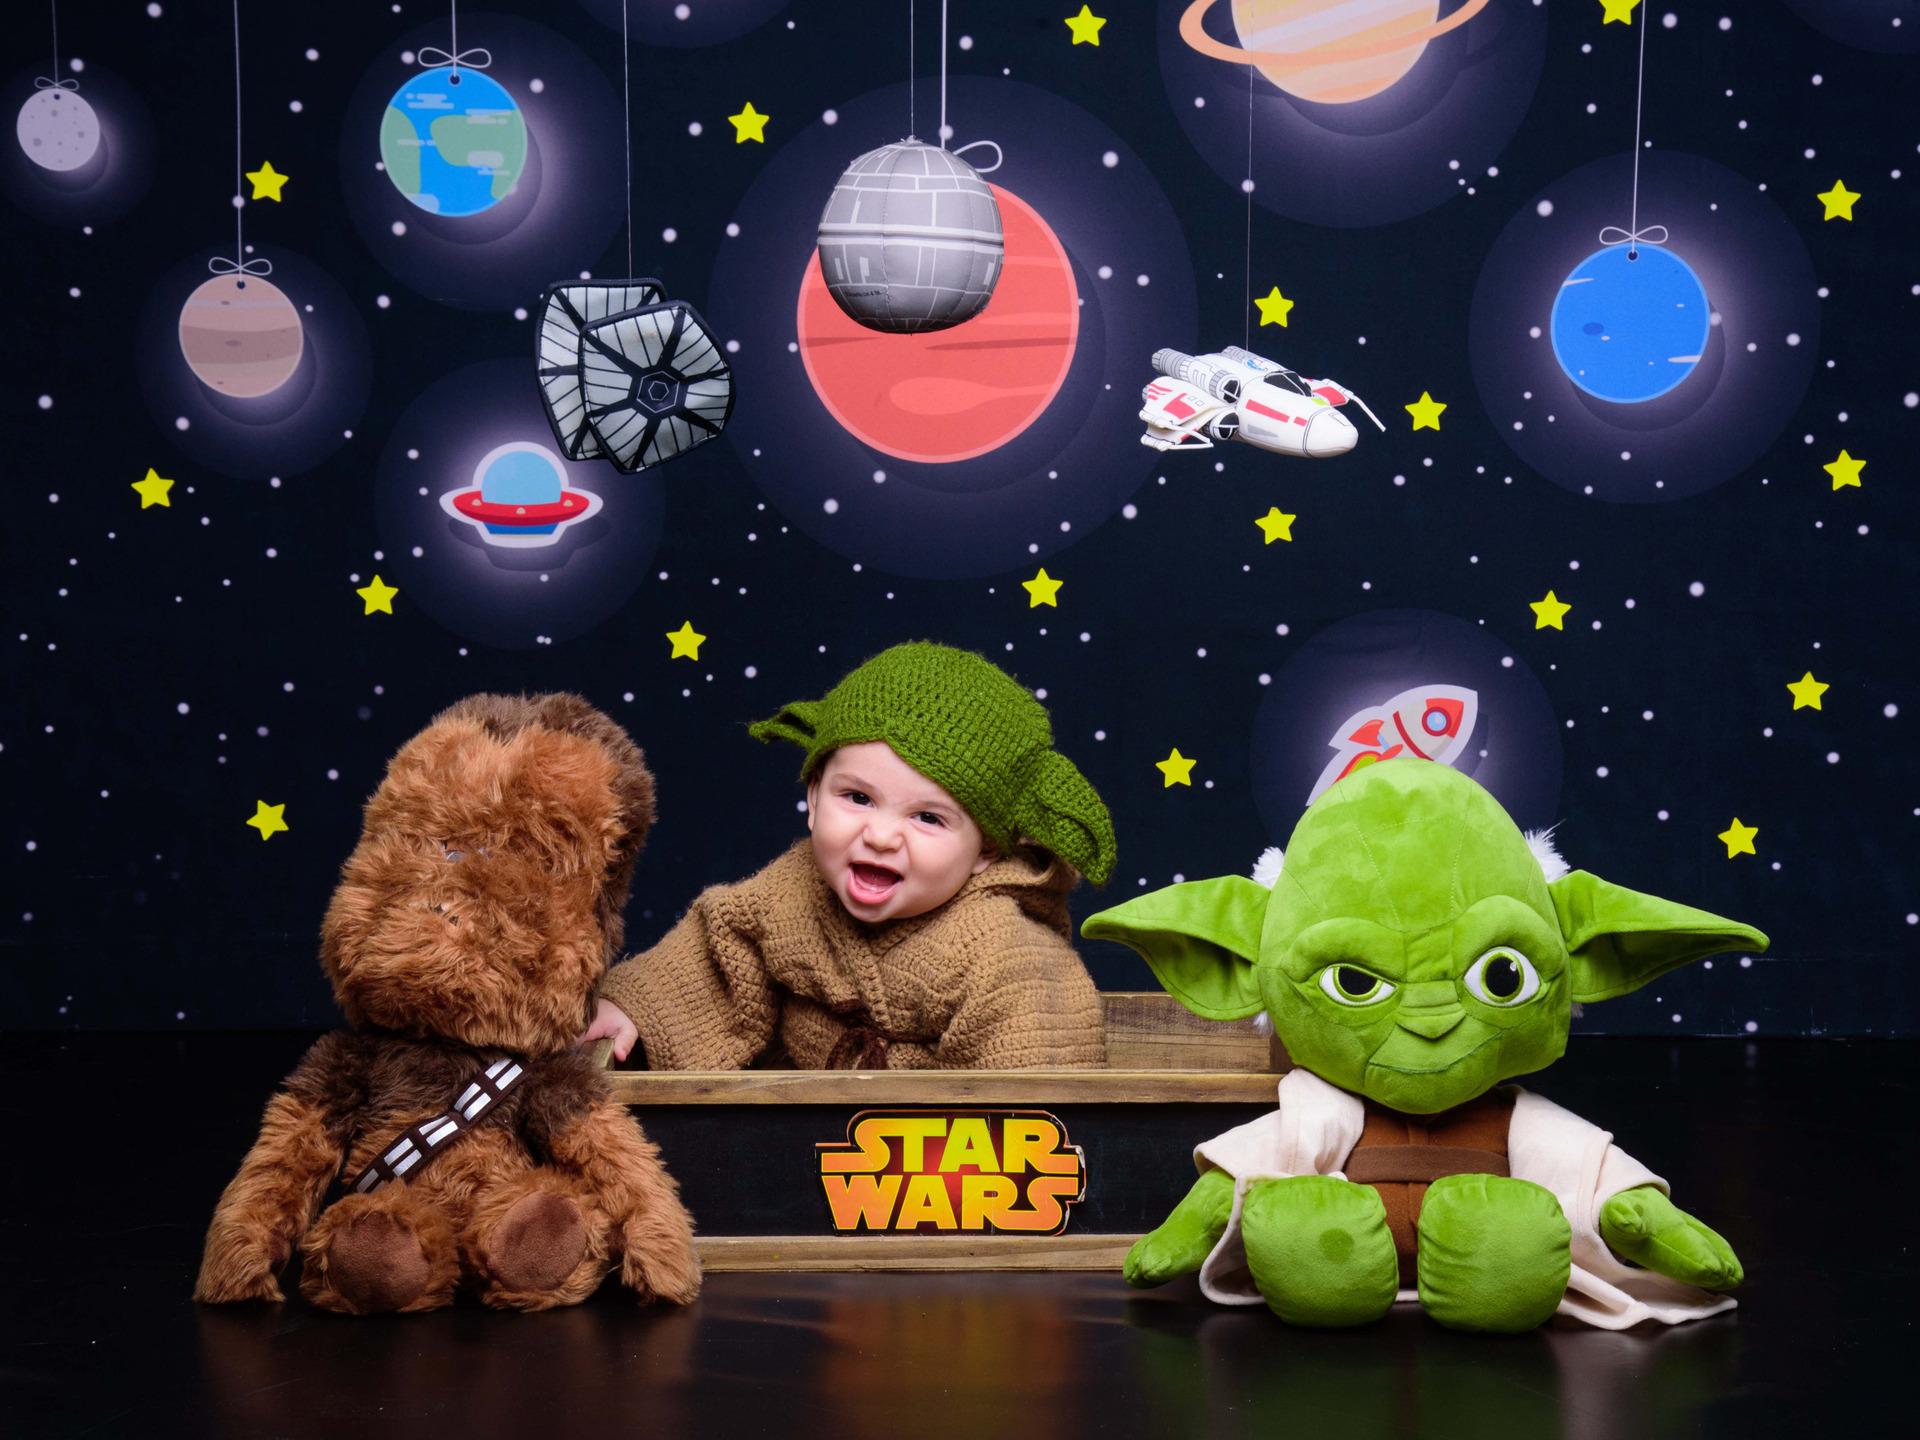 Star Wars, foto de bebê, ensaio infantil, fotografia infantil, sessão star wars, Mestre Yoda, Darth Vader, Milennium Falcon, Princesa Leia, Darth Sirius, Luke Skywalker, Han Solo, Obi-Wan, C-3PO, Chewbacca picadeiro, bebê fantasiado, bebê Yoda, inspiração ensaio bebês, foto de star wars, sessão fotografica familia, bebês fofos, bebês sorridentes, sessão nerd, bebê nerd